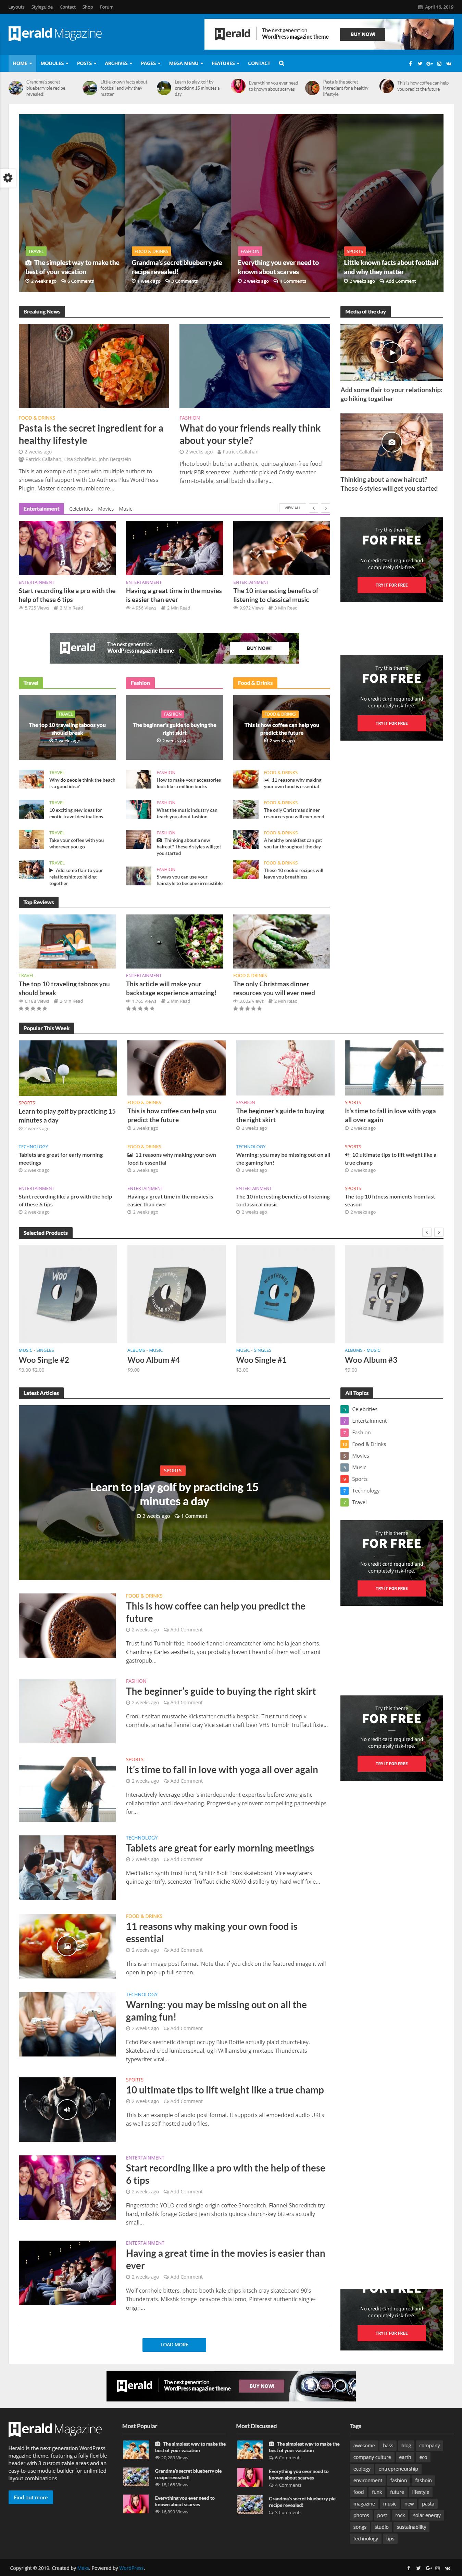 Herald - Mejor tema de WordPress de revisión premium